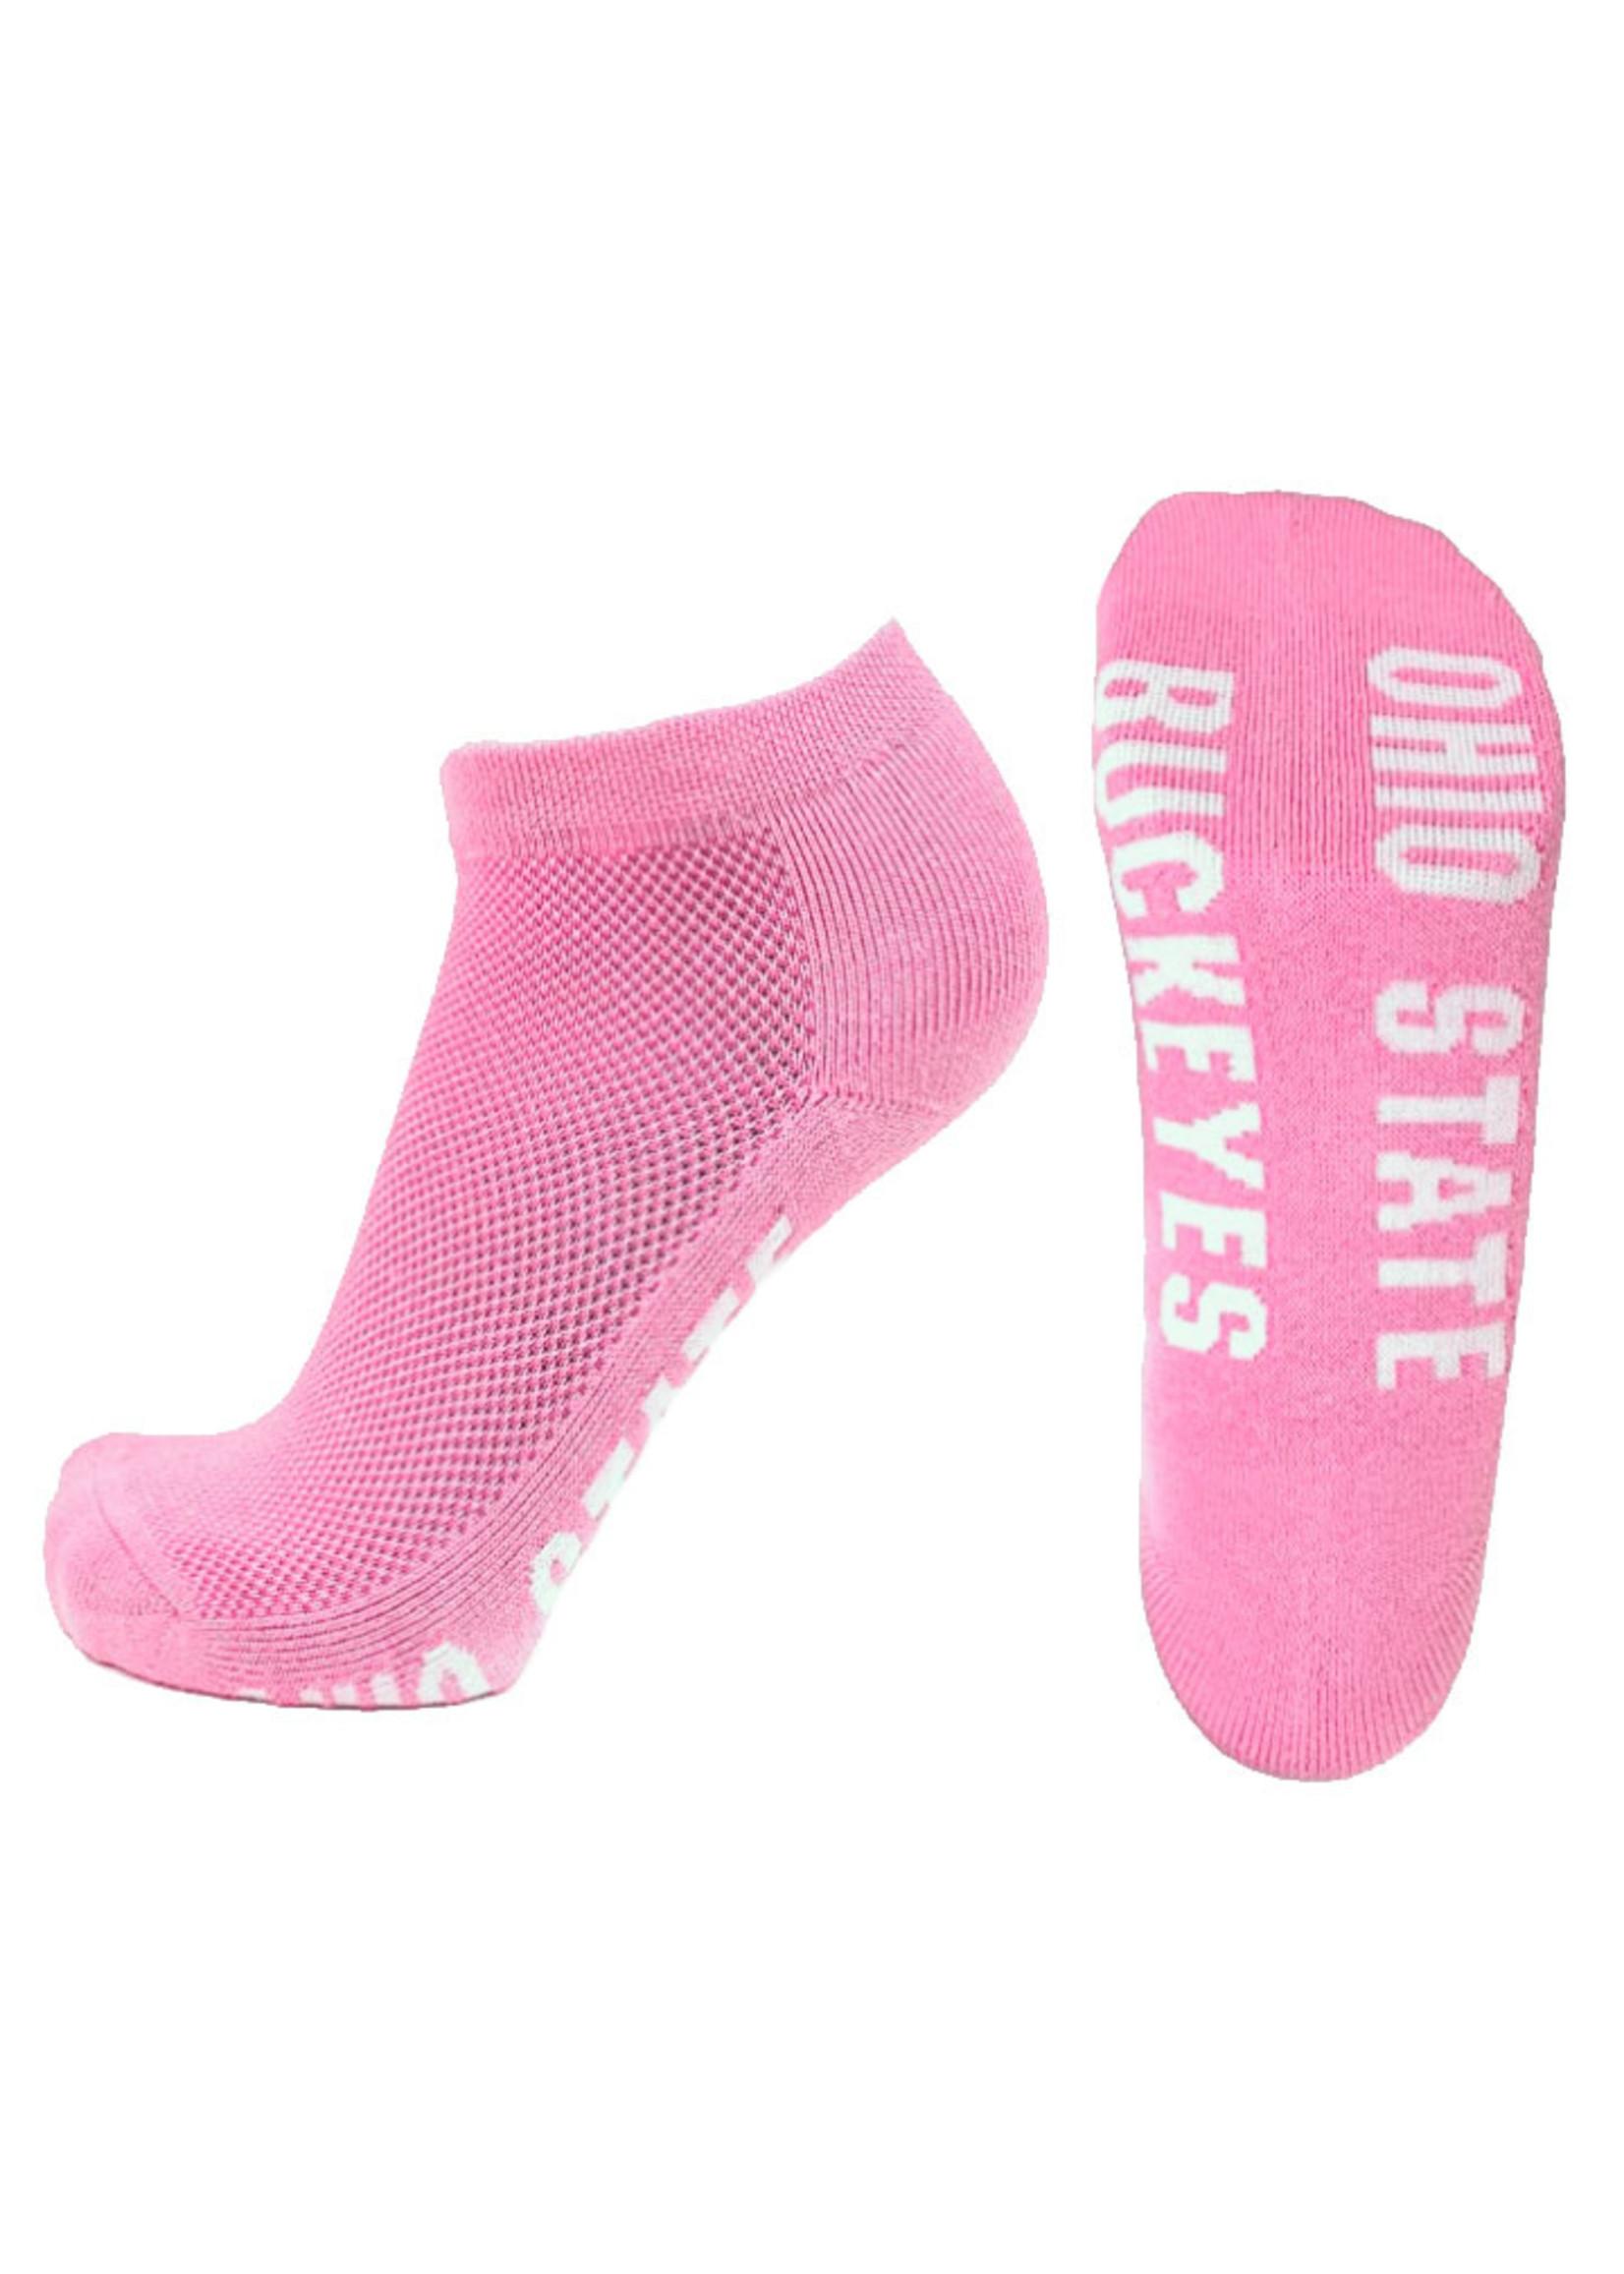 Ohio State Buckeyes Pink No Show Footie Socks